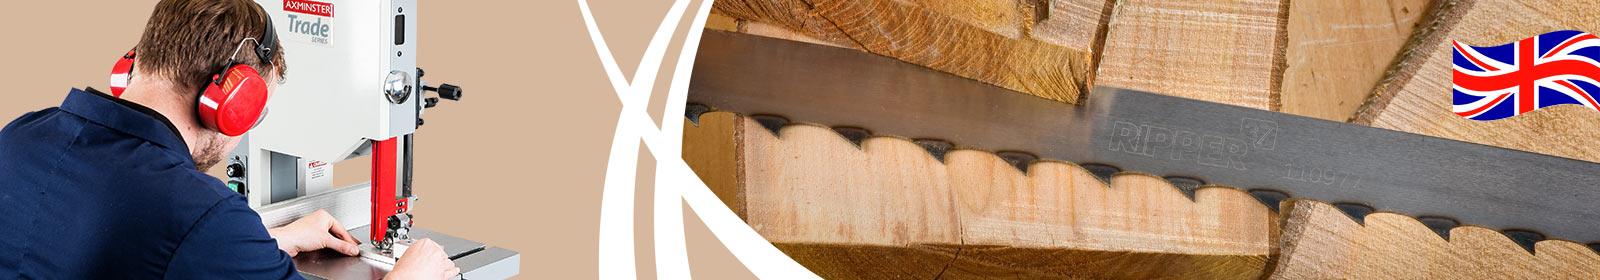 Axcaliber Bandsaw Blades - UK made